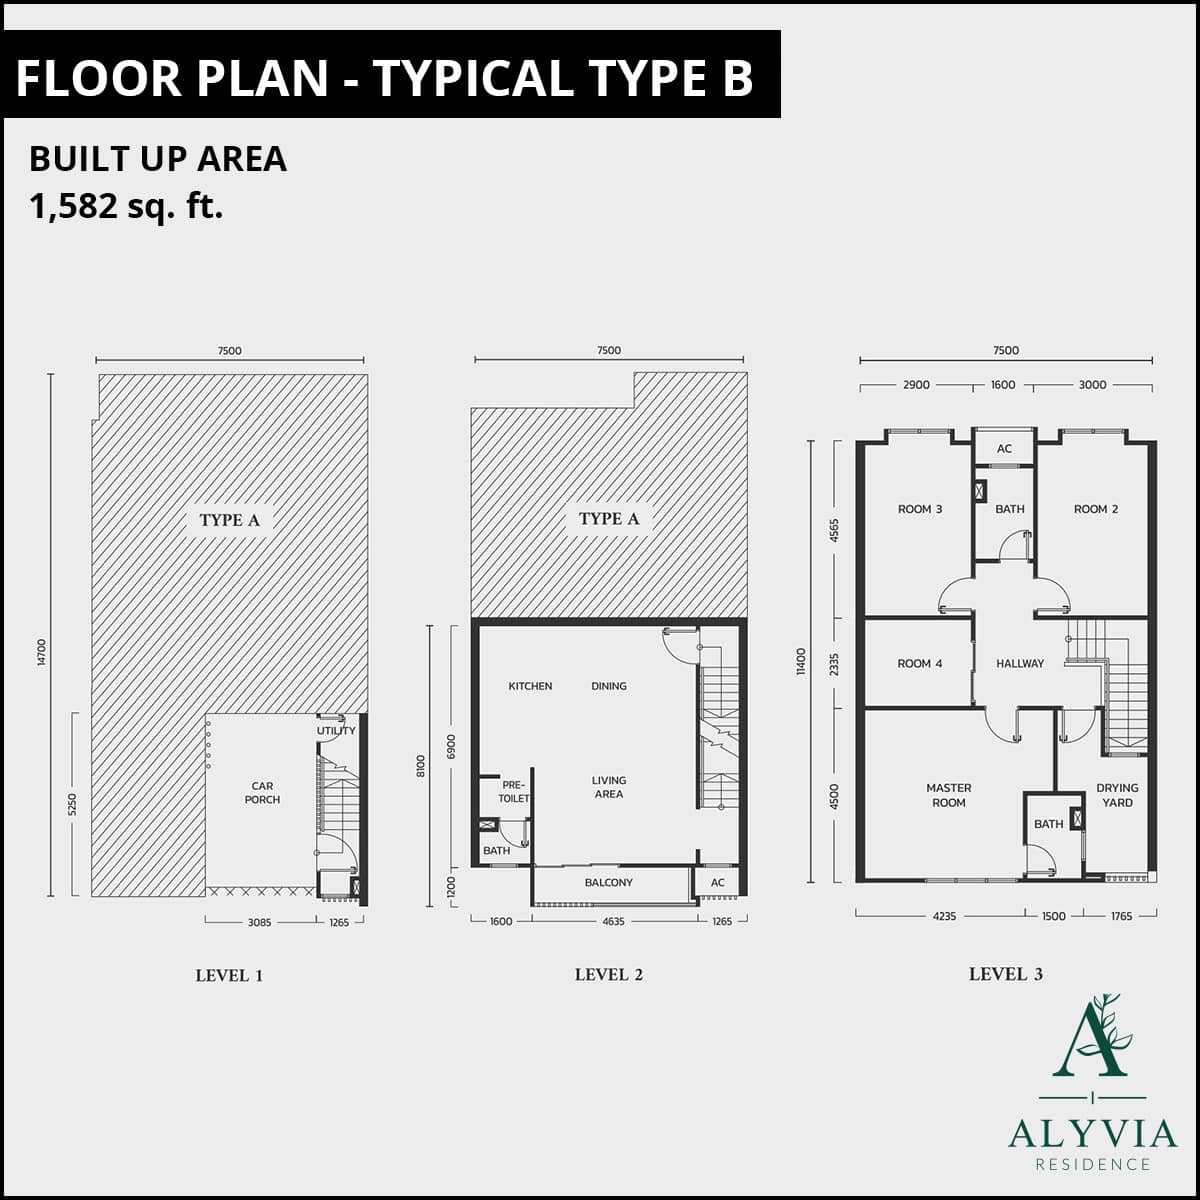 https://the-northbank.com/wp-content/uploads/2020/03/alyvia-floorplan-typeB.jpg